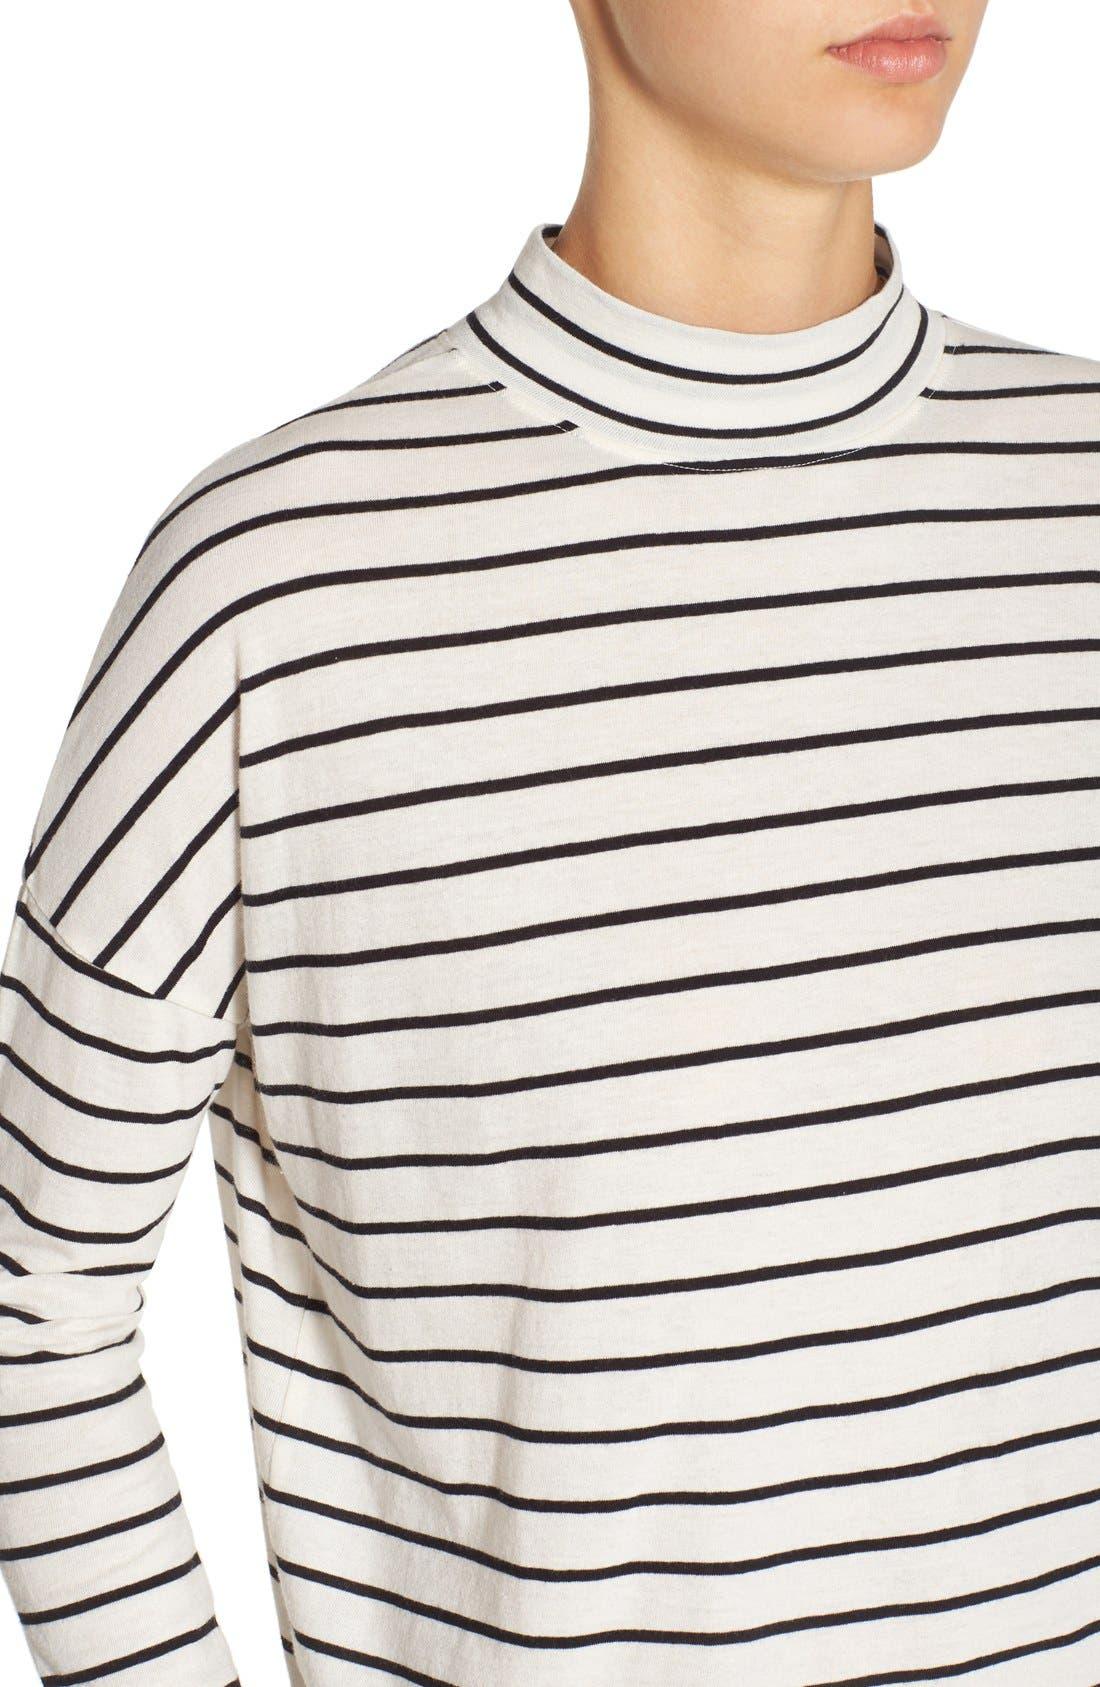 BP., Stripe Long Sleeve Mock Neck Tee, Alternate thumbnail 5, color, 900